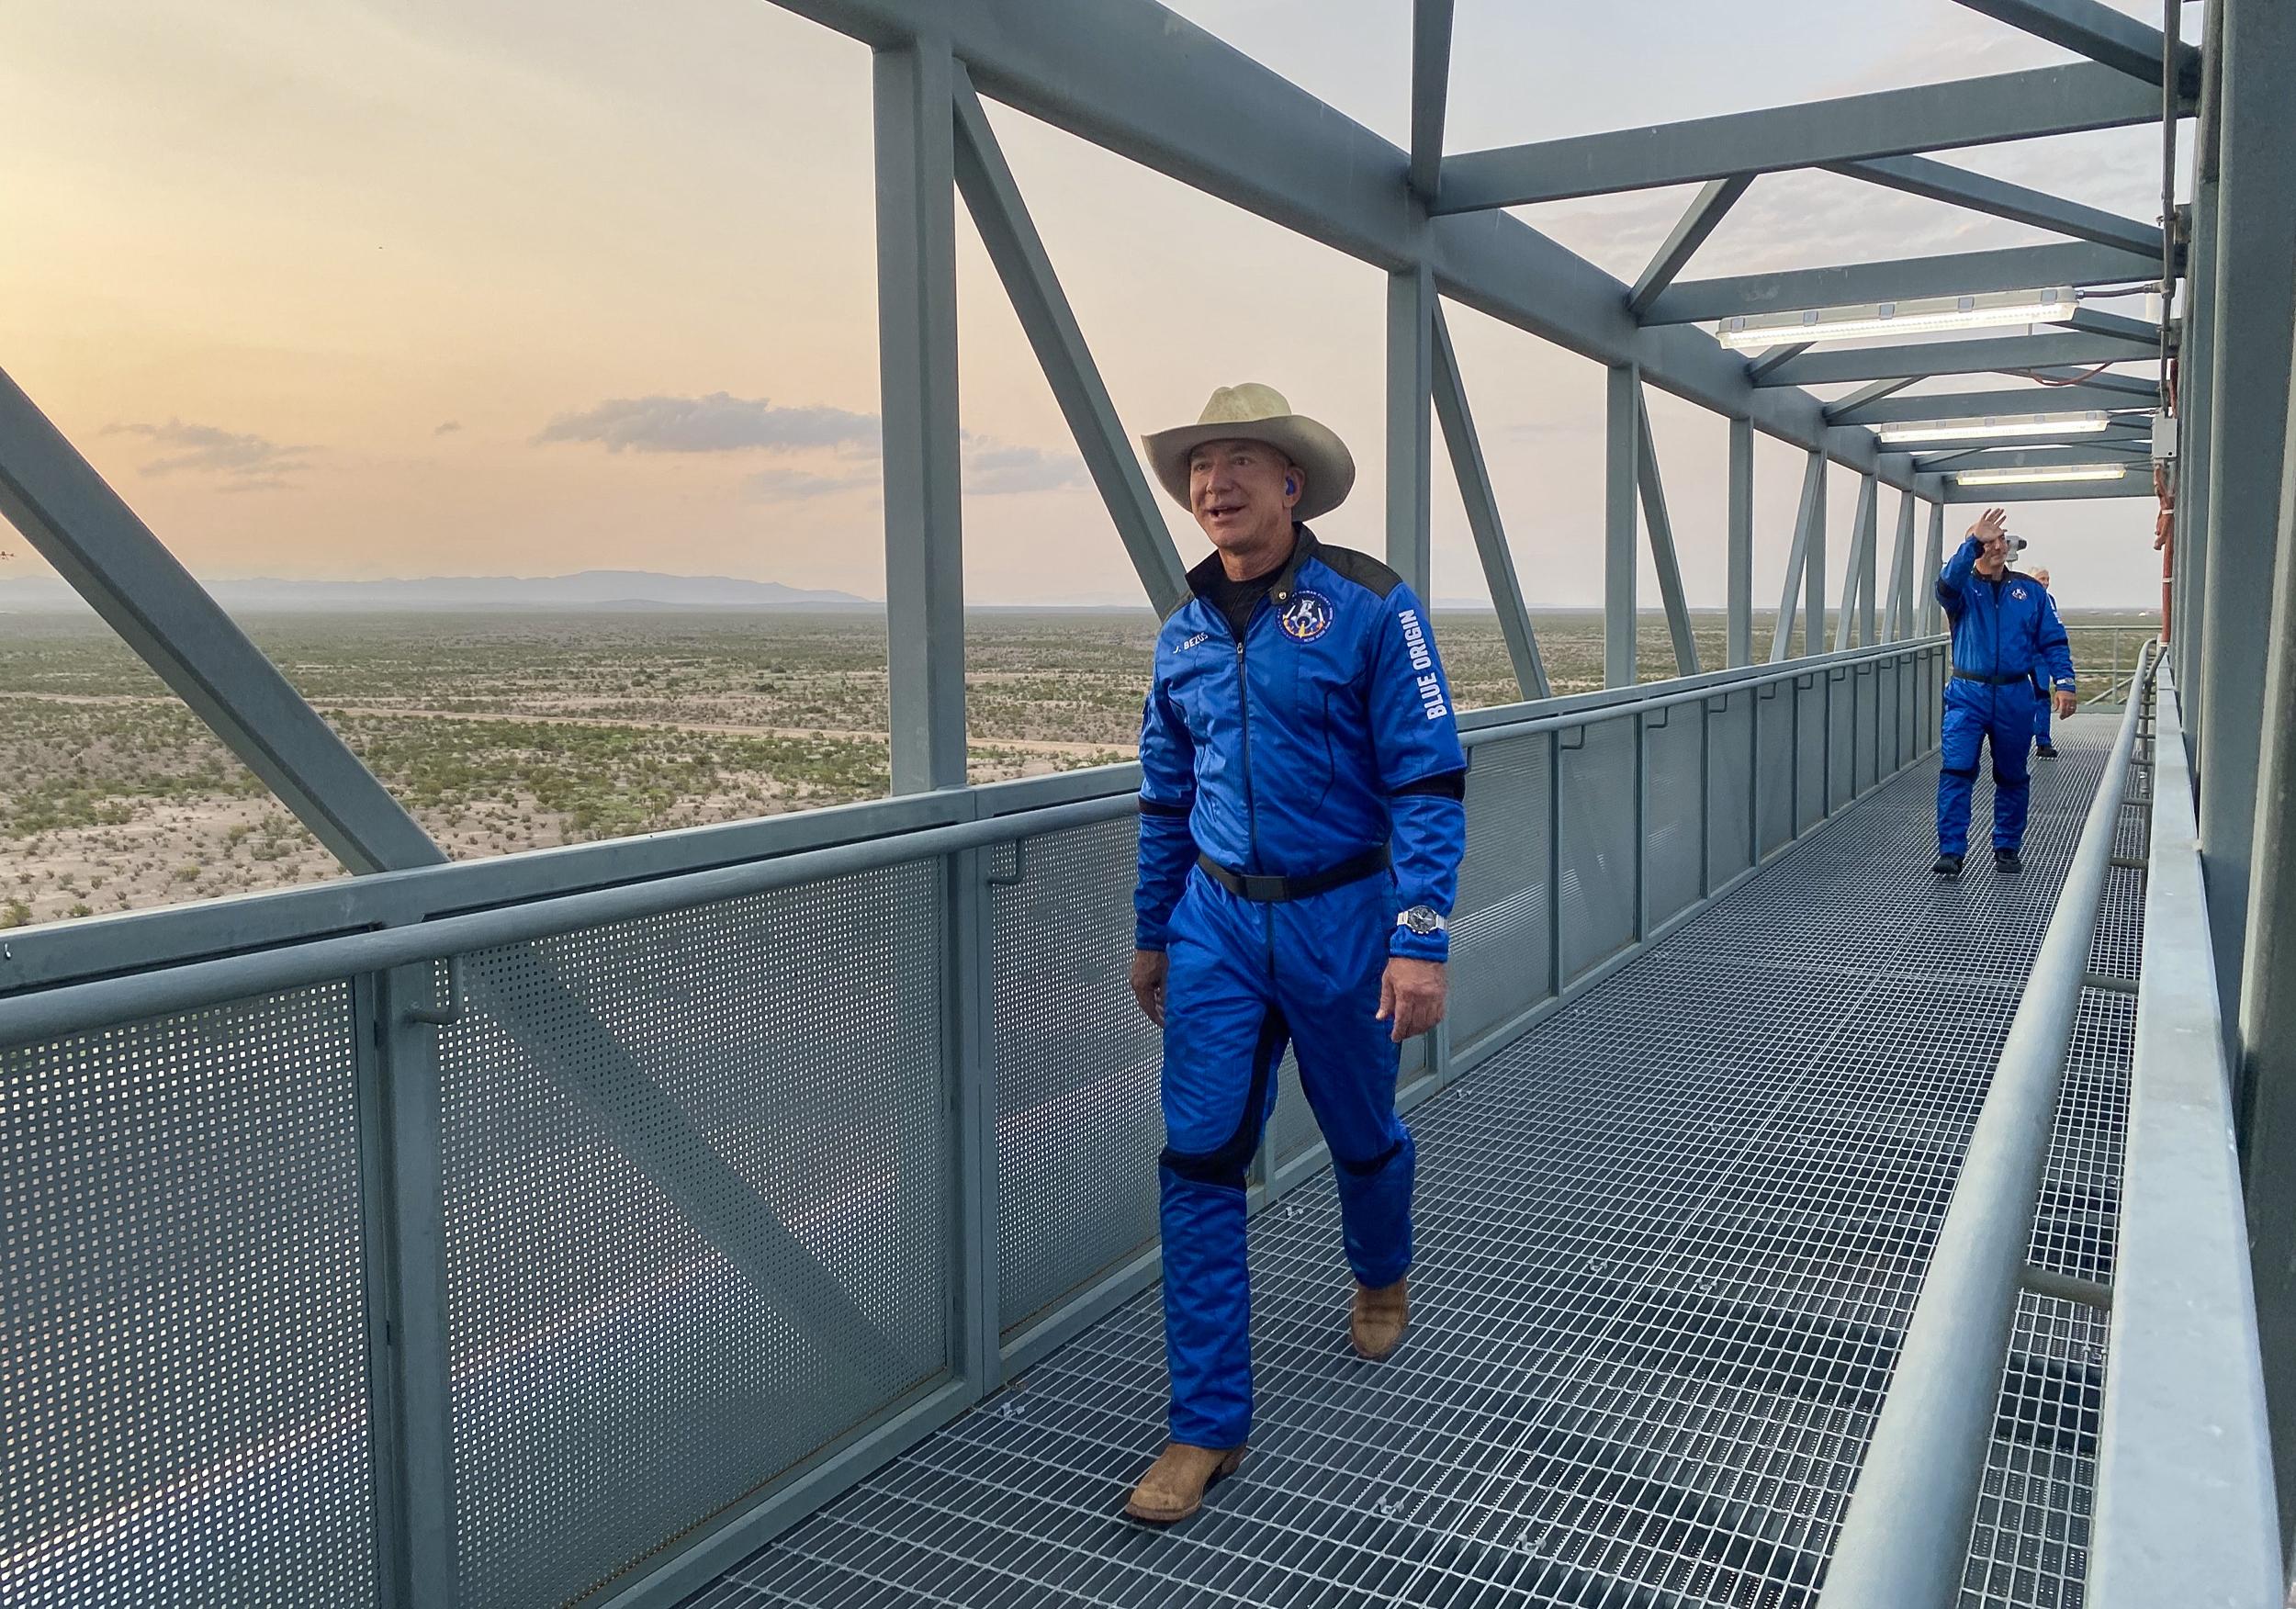 Bezos' Blue Origin takes NASA to court over SpaceX lunar lander contract